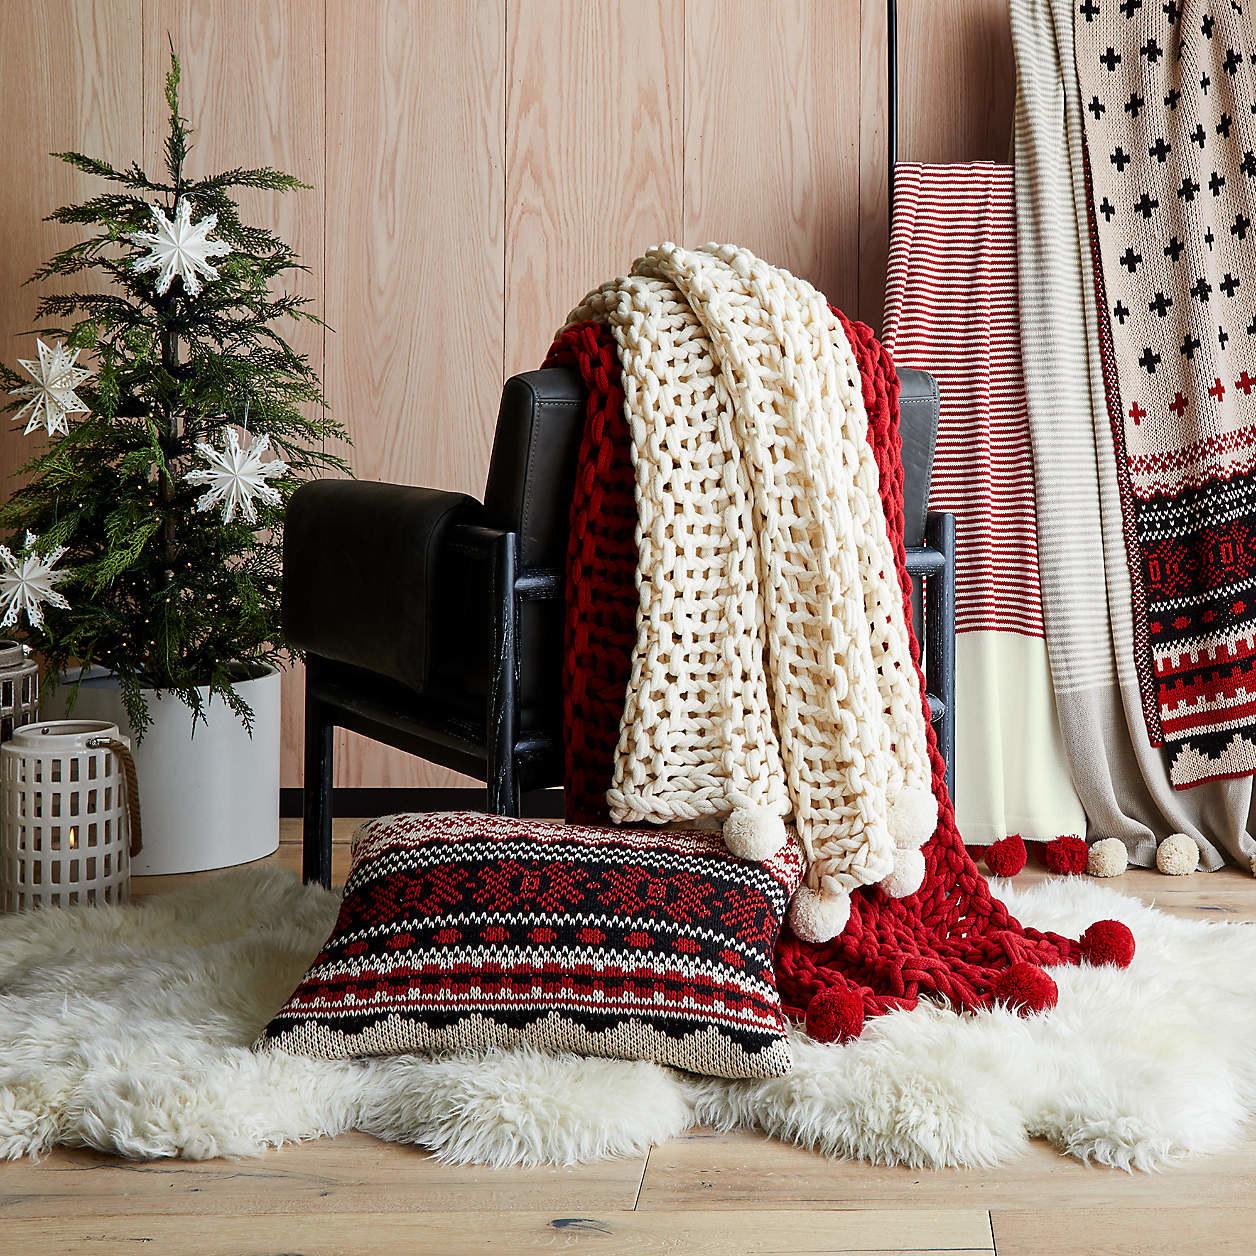 Virka Ivory Throw blankets